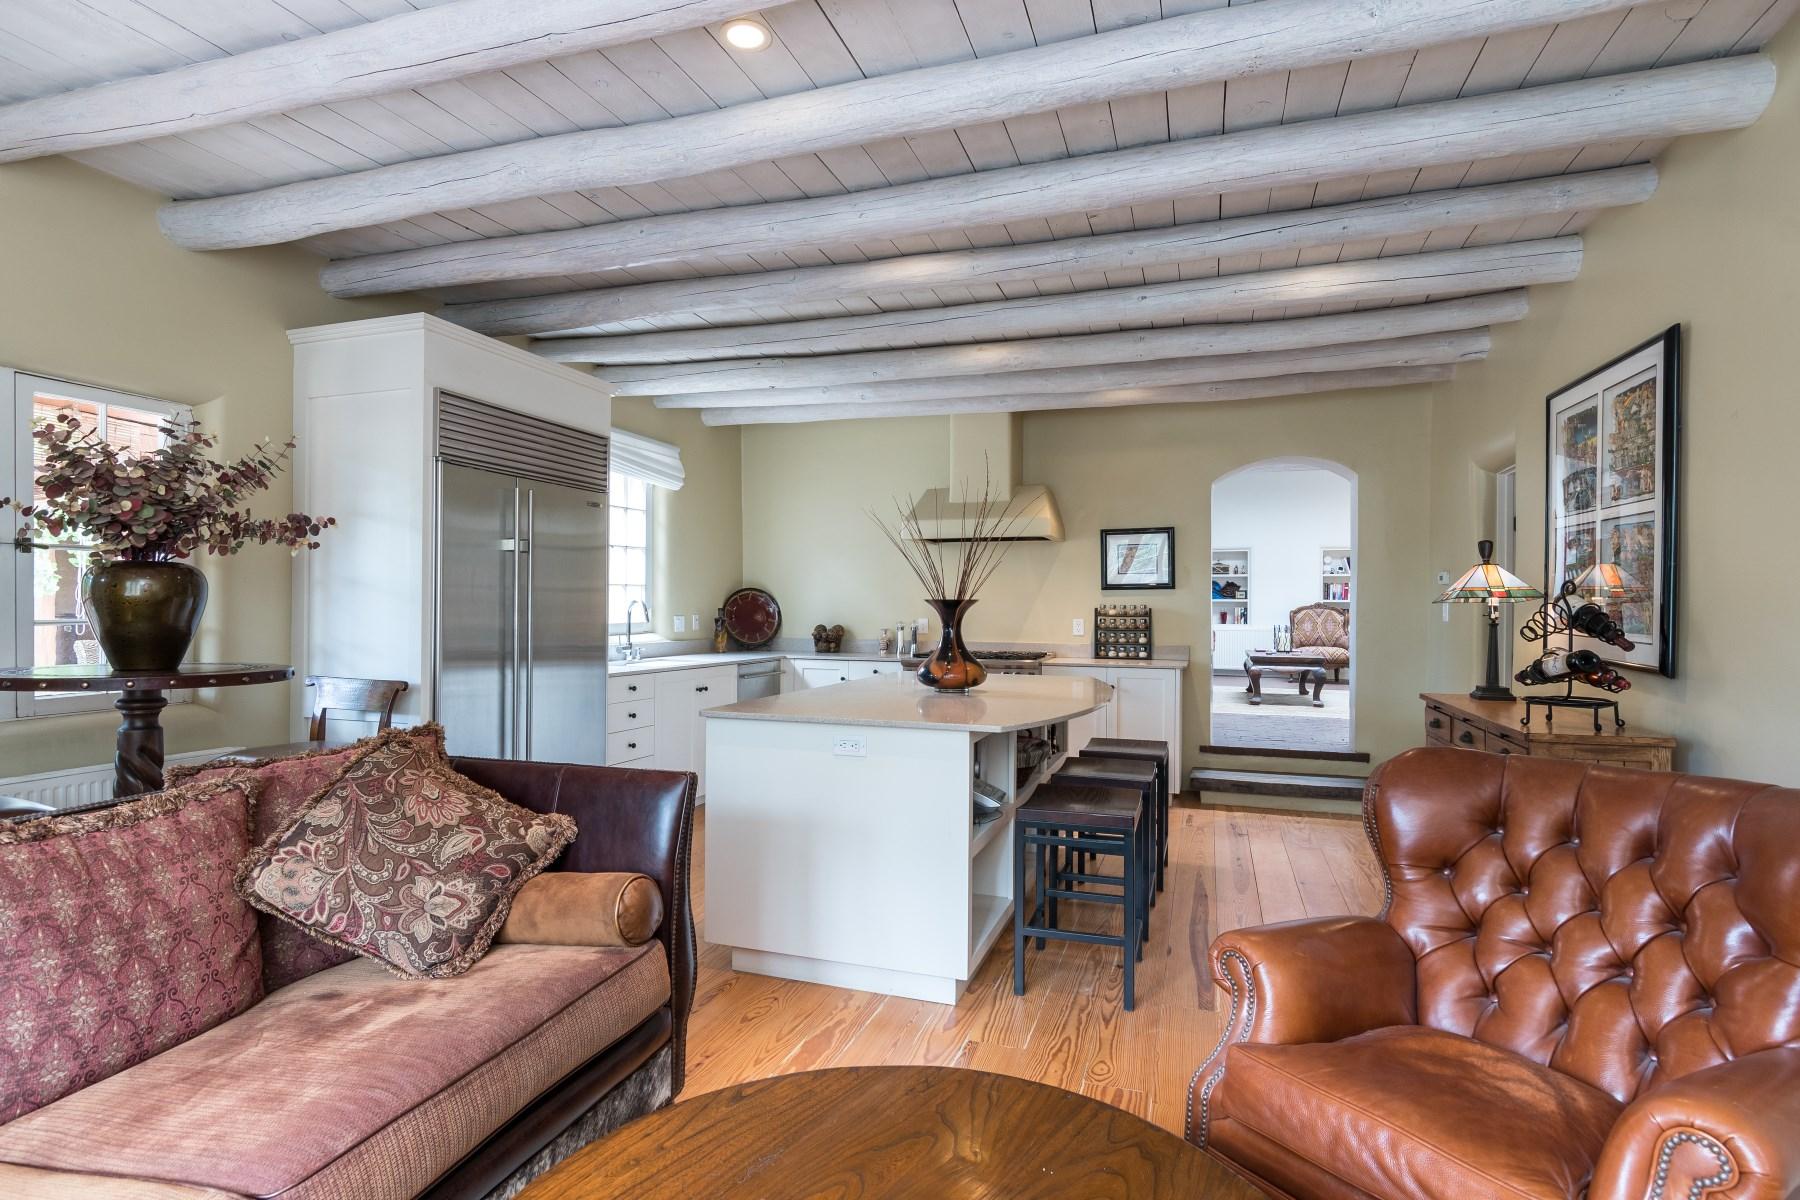 Single Family Home for Sale at 525 Hillside Ave. Santa Fe City Northeast, Santa Fe, New Mexico, 87501 United States